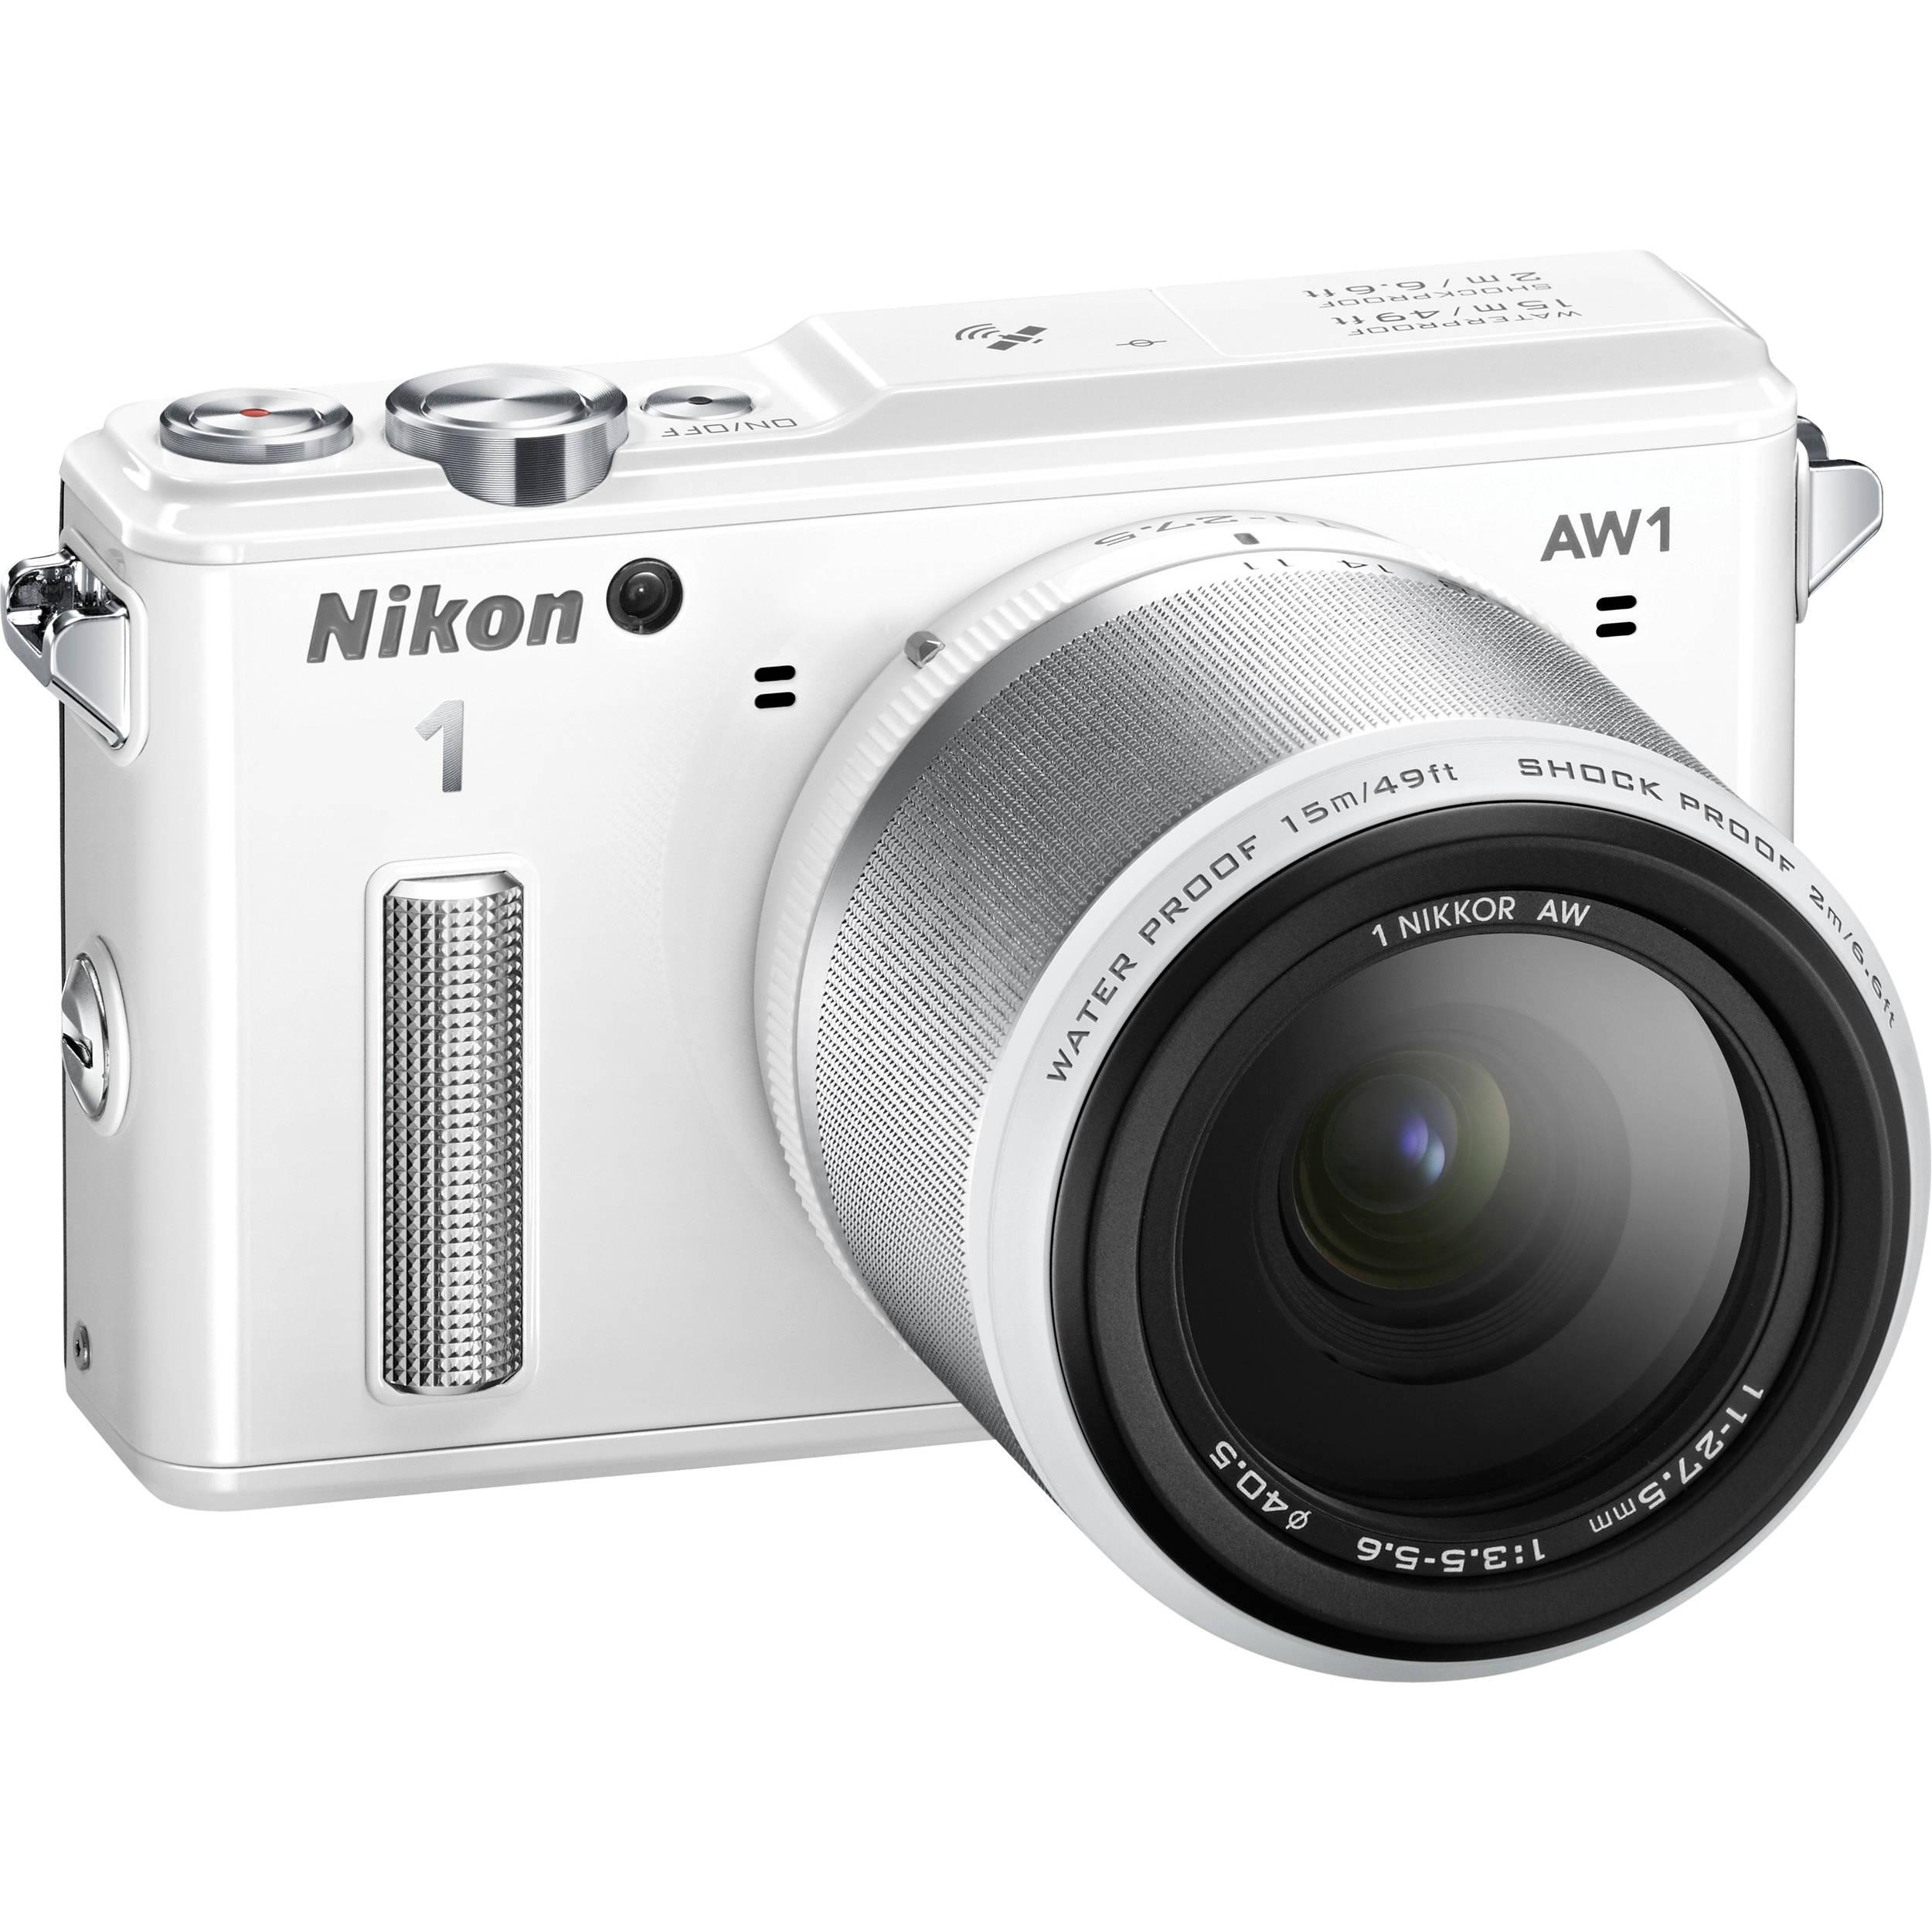 Nikon 1 AW1 Mirrorless Digital Camera with 11-27 5mm Lens (White)